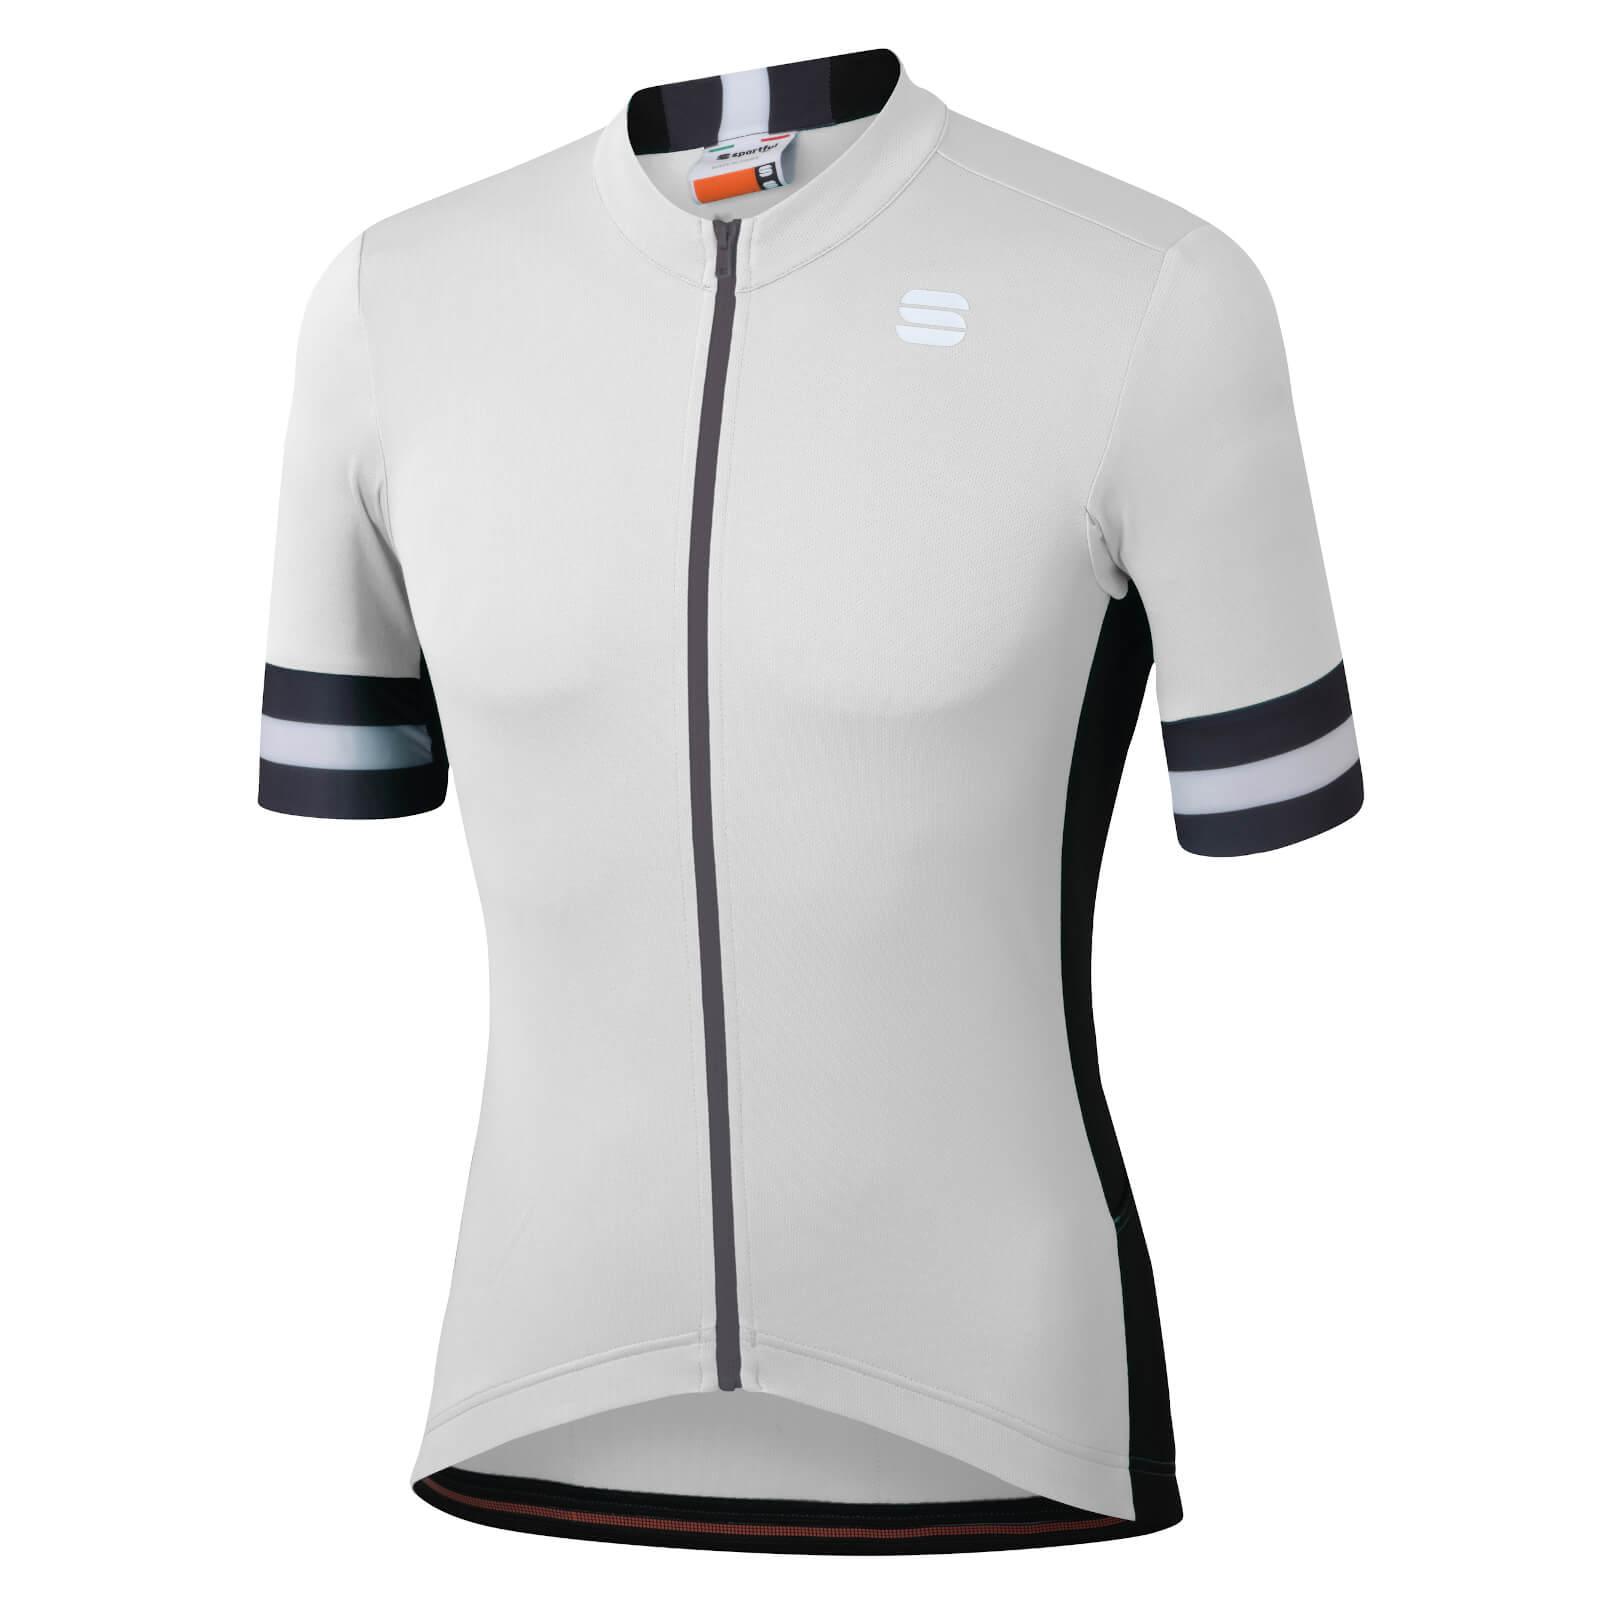 Sportful Kite Jersey - M - White